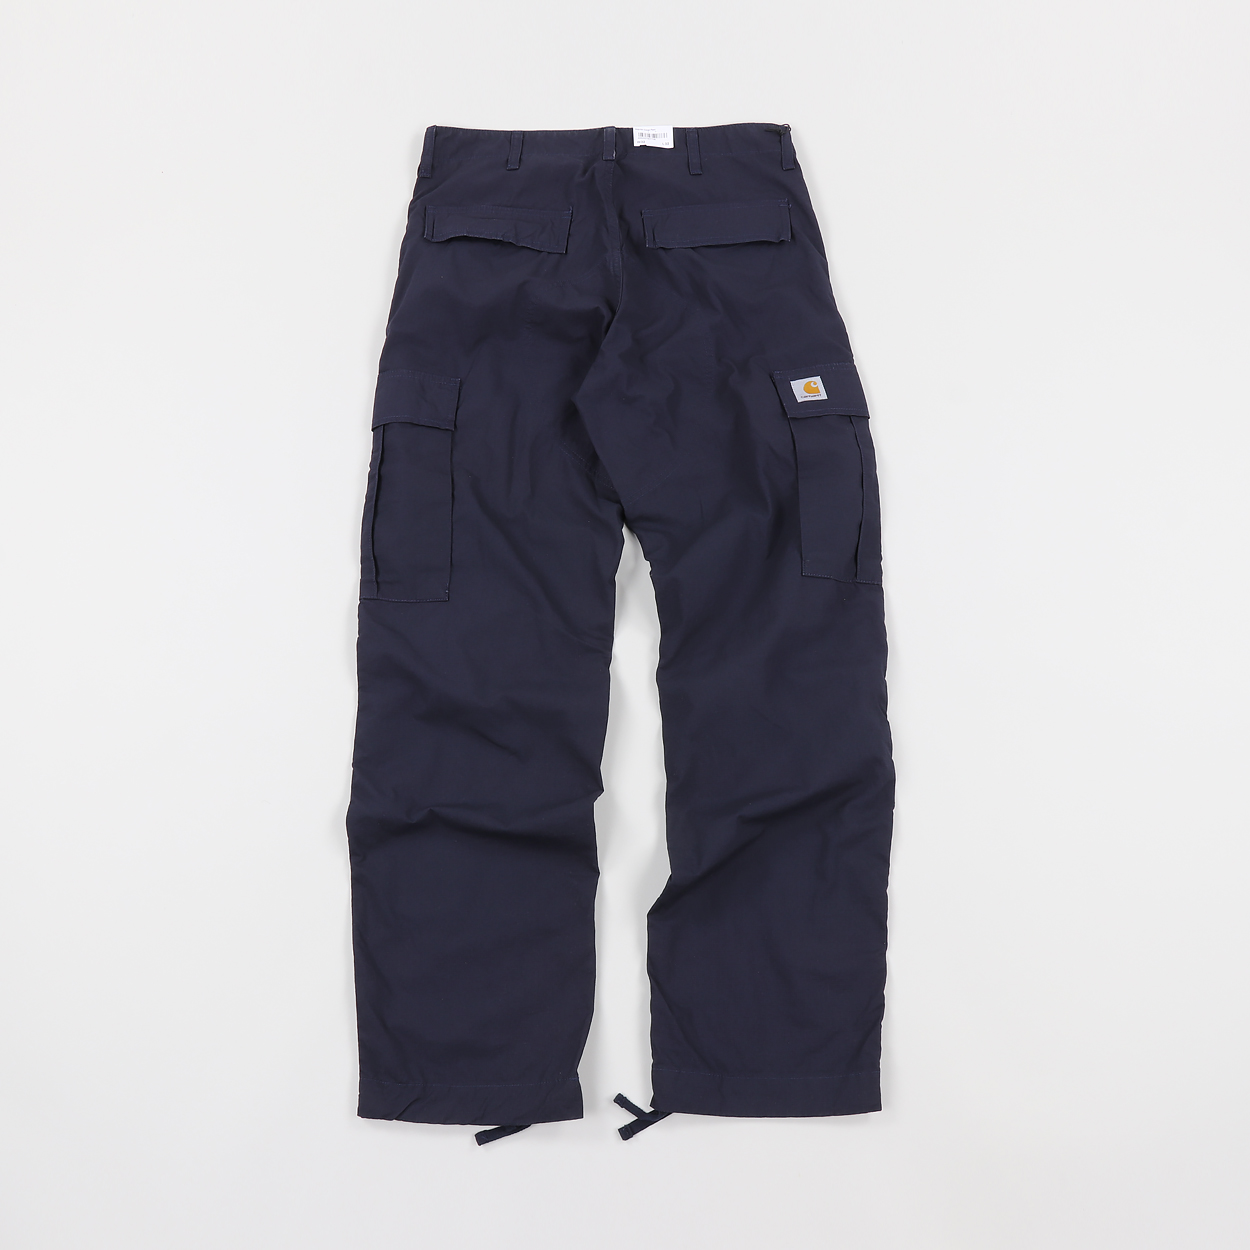 cd9fd407 Mens Carhartt Regular Fit Cargo Pants Trousers Navy Blue Ripstop £71.00